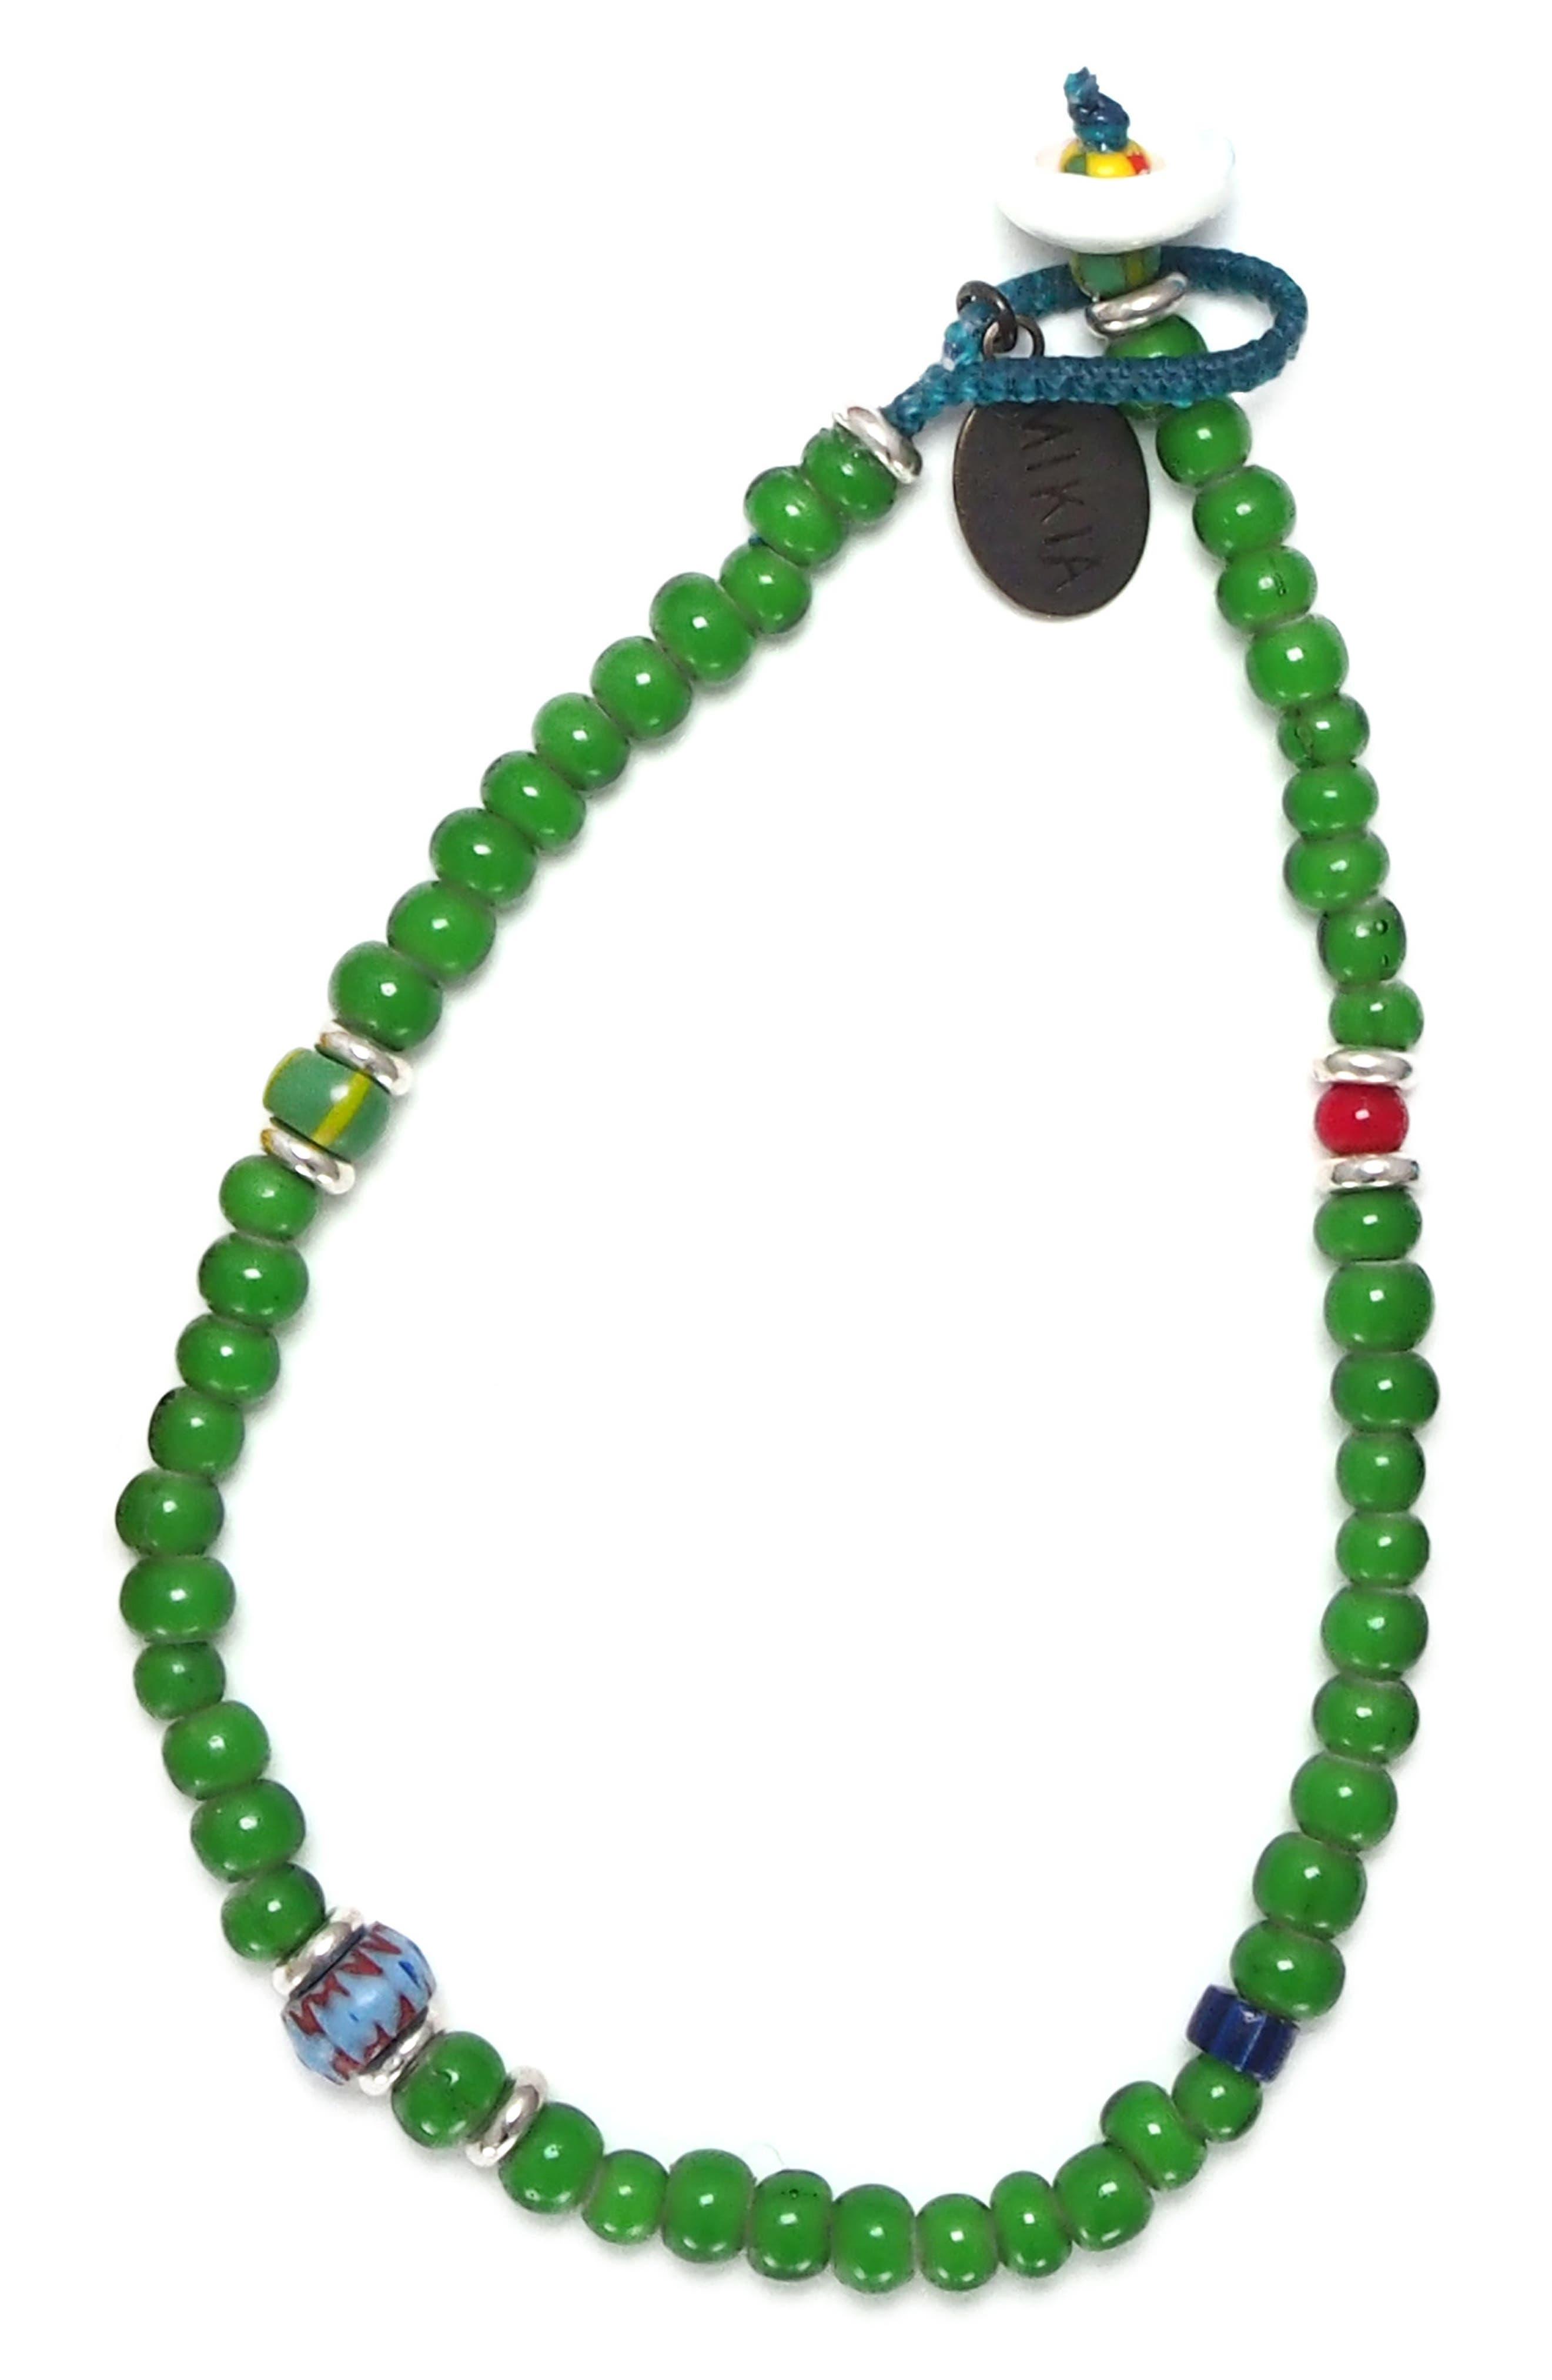 White Hearts Bead Bracelet,                             Main thumbnail 1, color,                             300